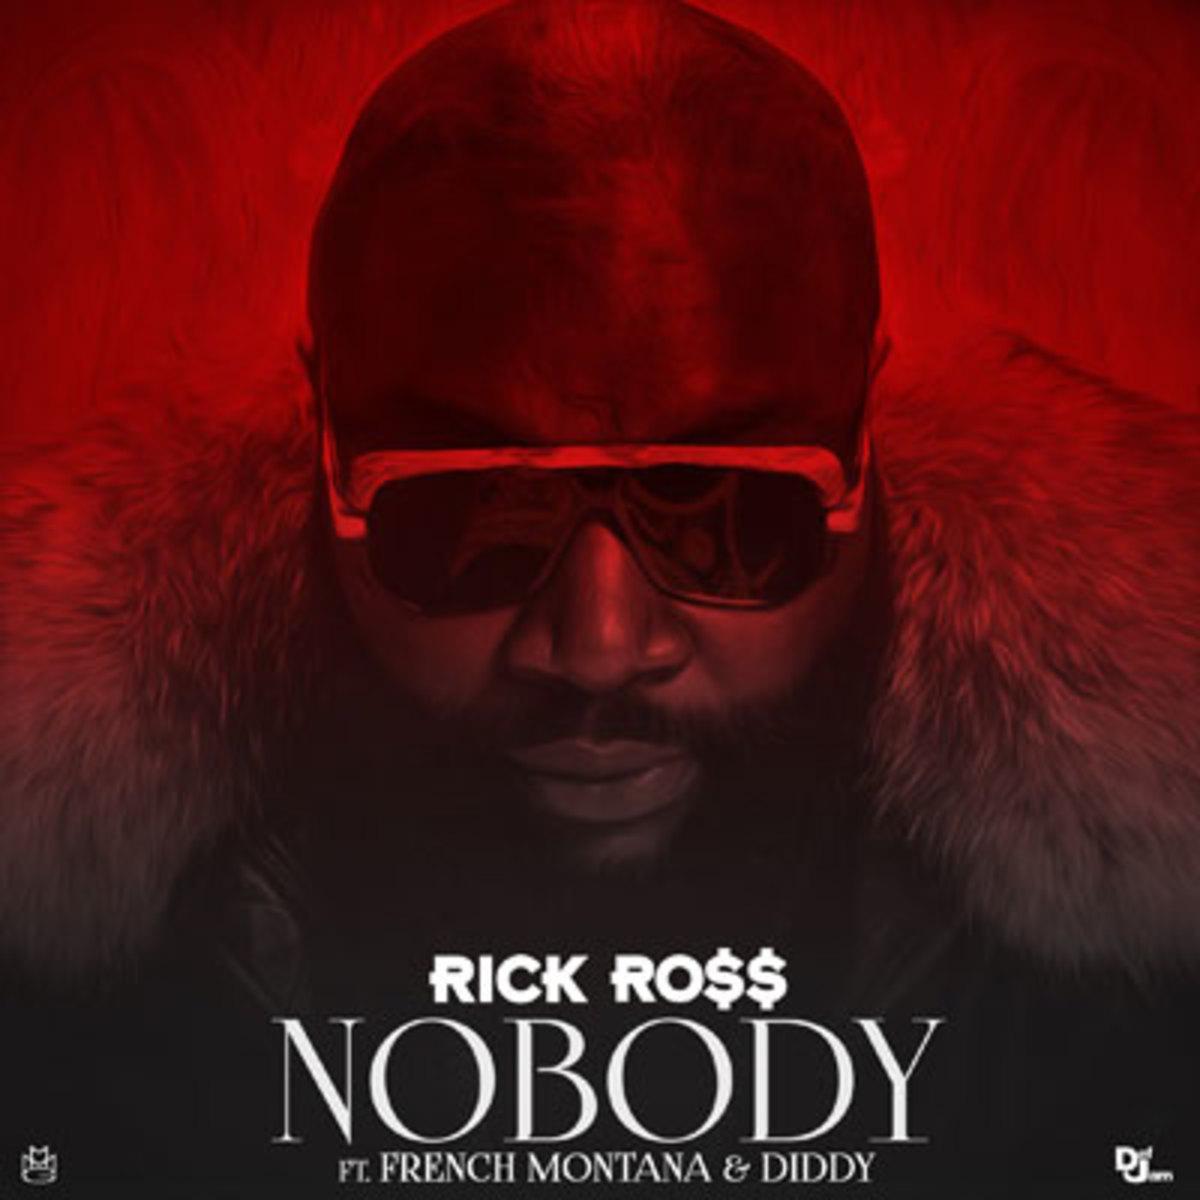 rickross-nobody.jpg